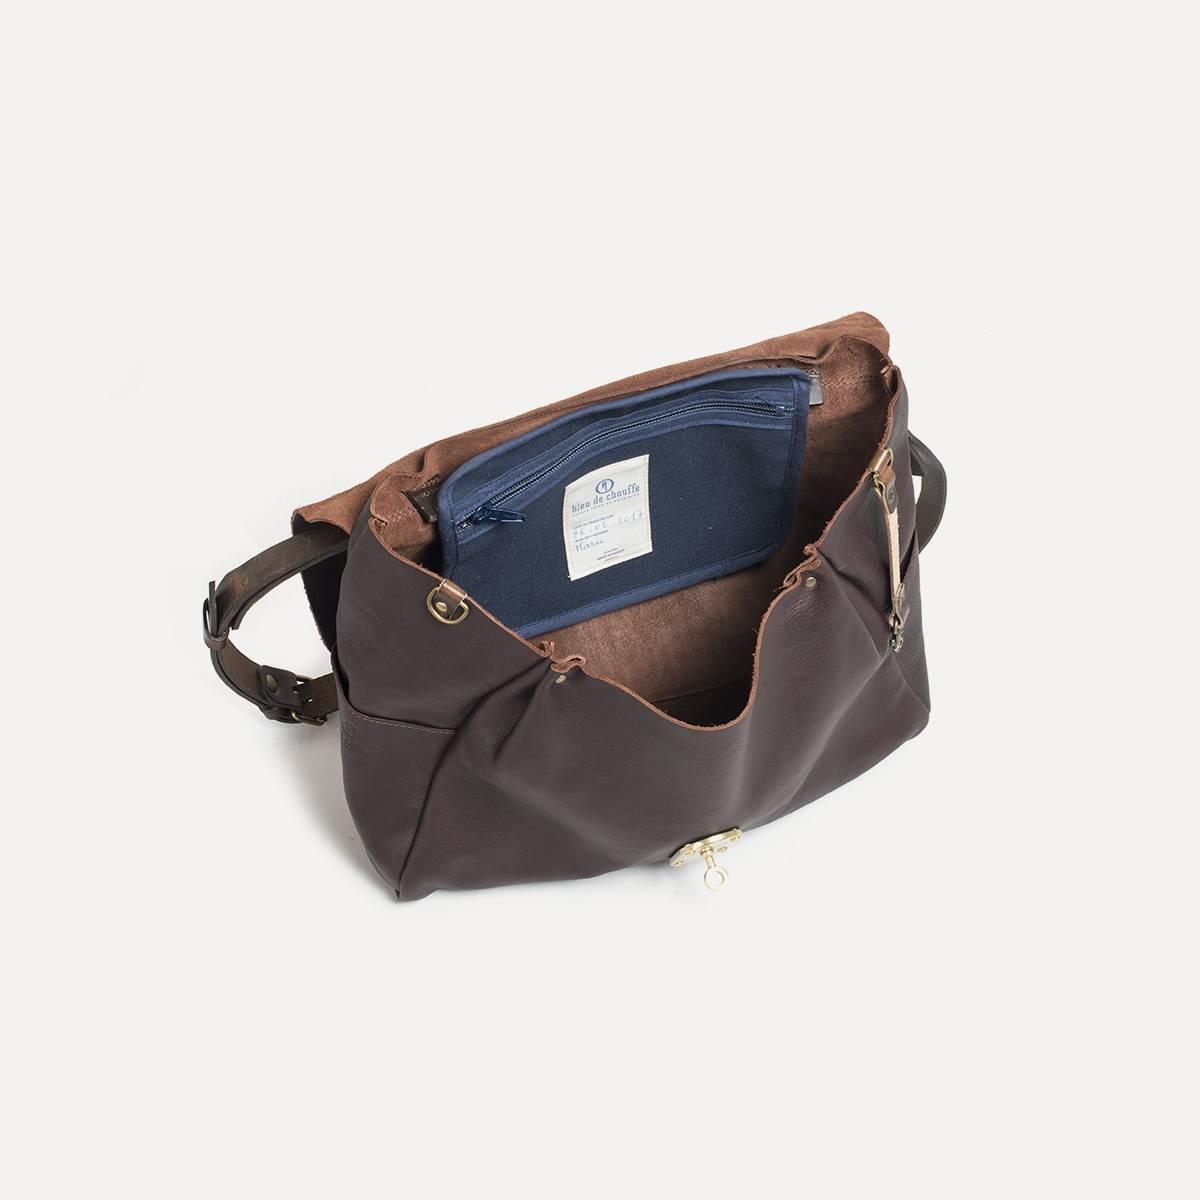 Coline bag M - Peat (image n°6)